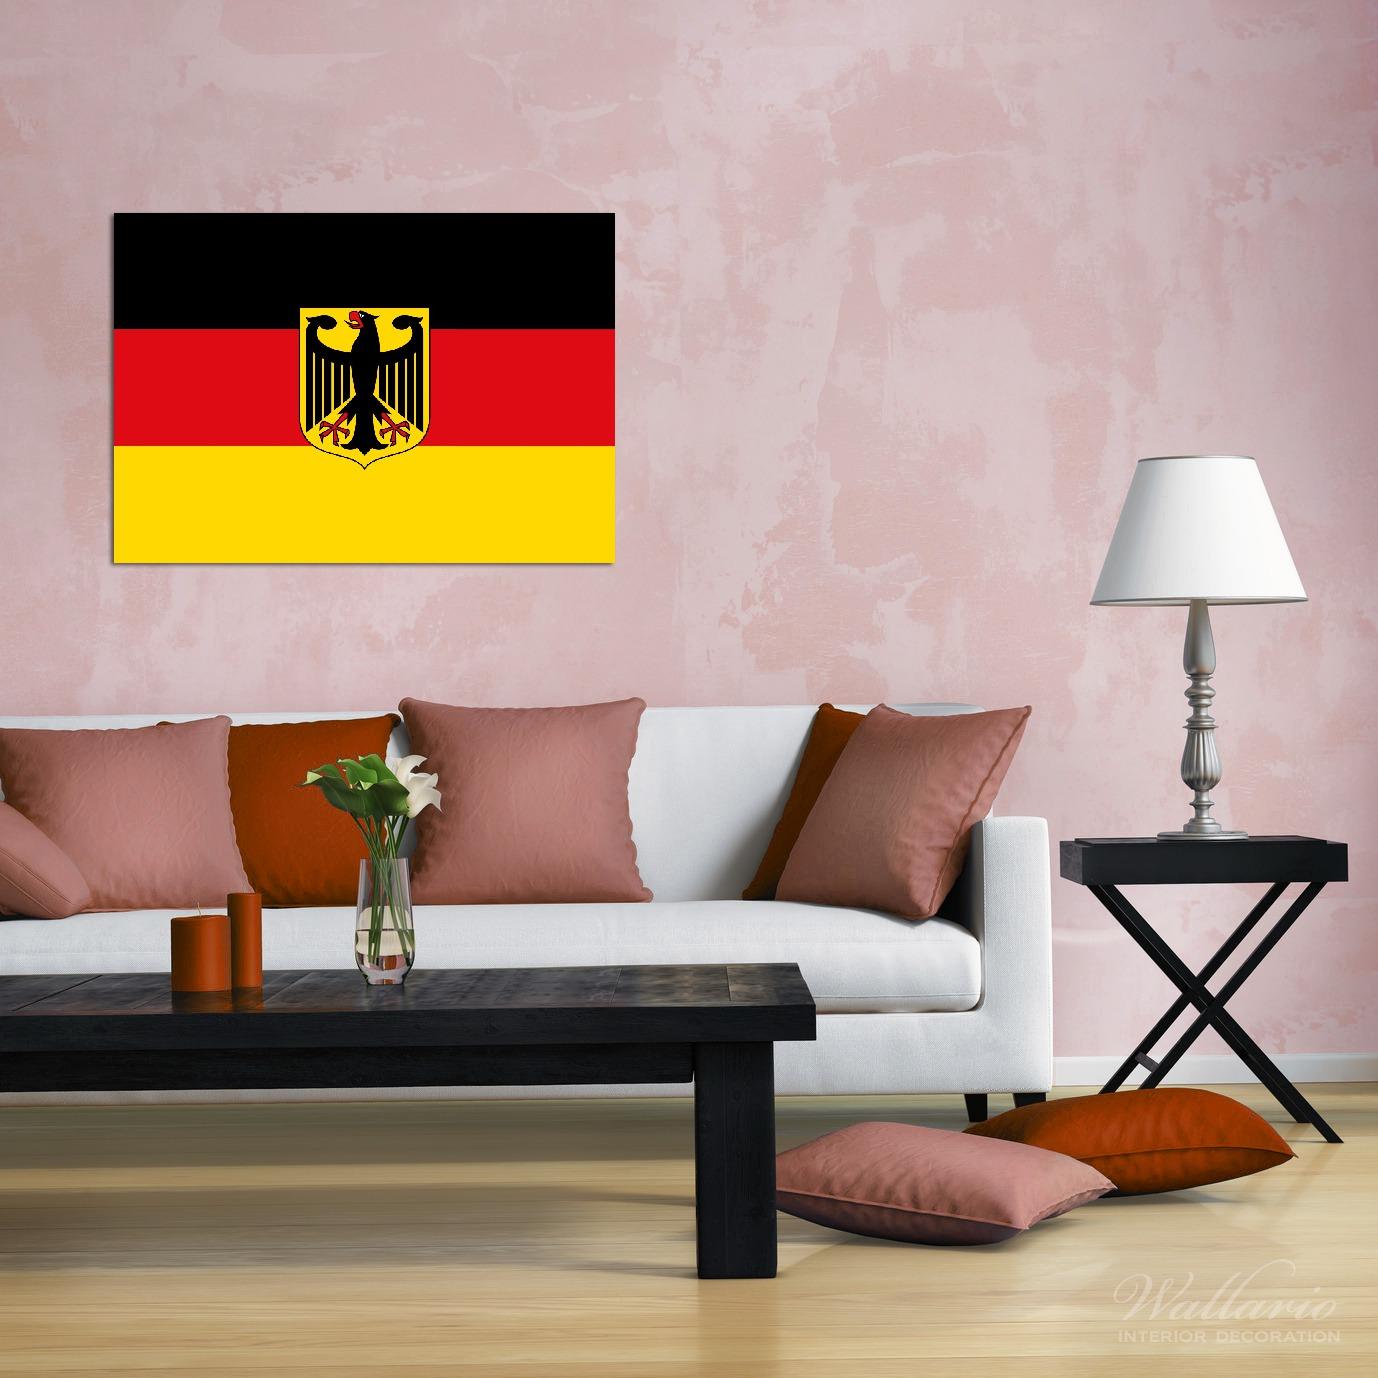 Wandbild Deutsche Flagge mit Wappen – Bild 2